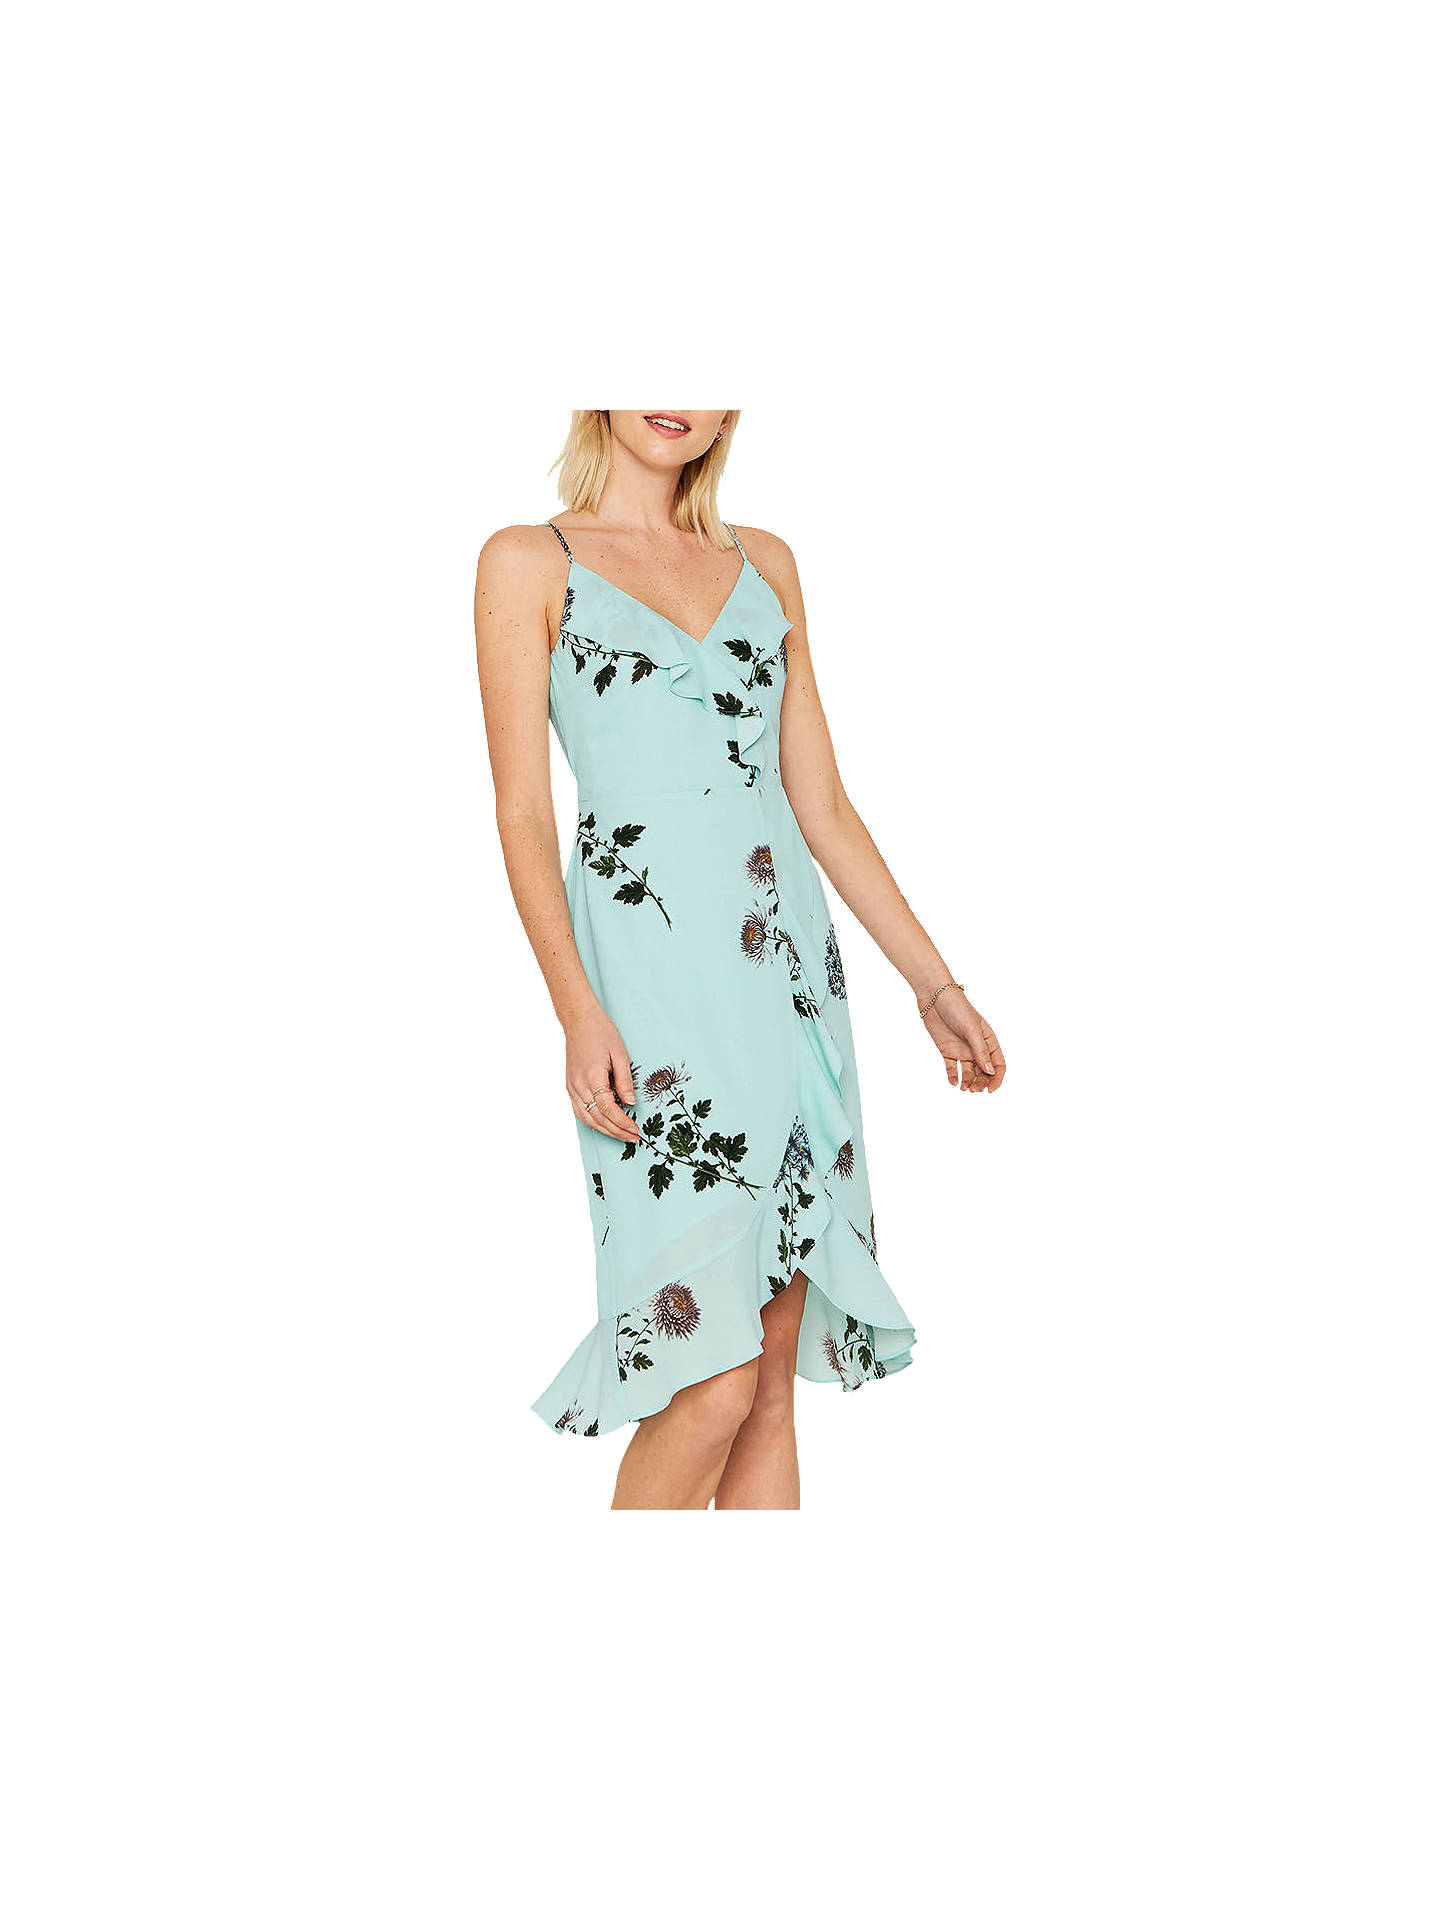 2a8e4e9676 Buy Oasis Natural History Museum Long Frill Cami Dress